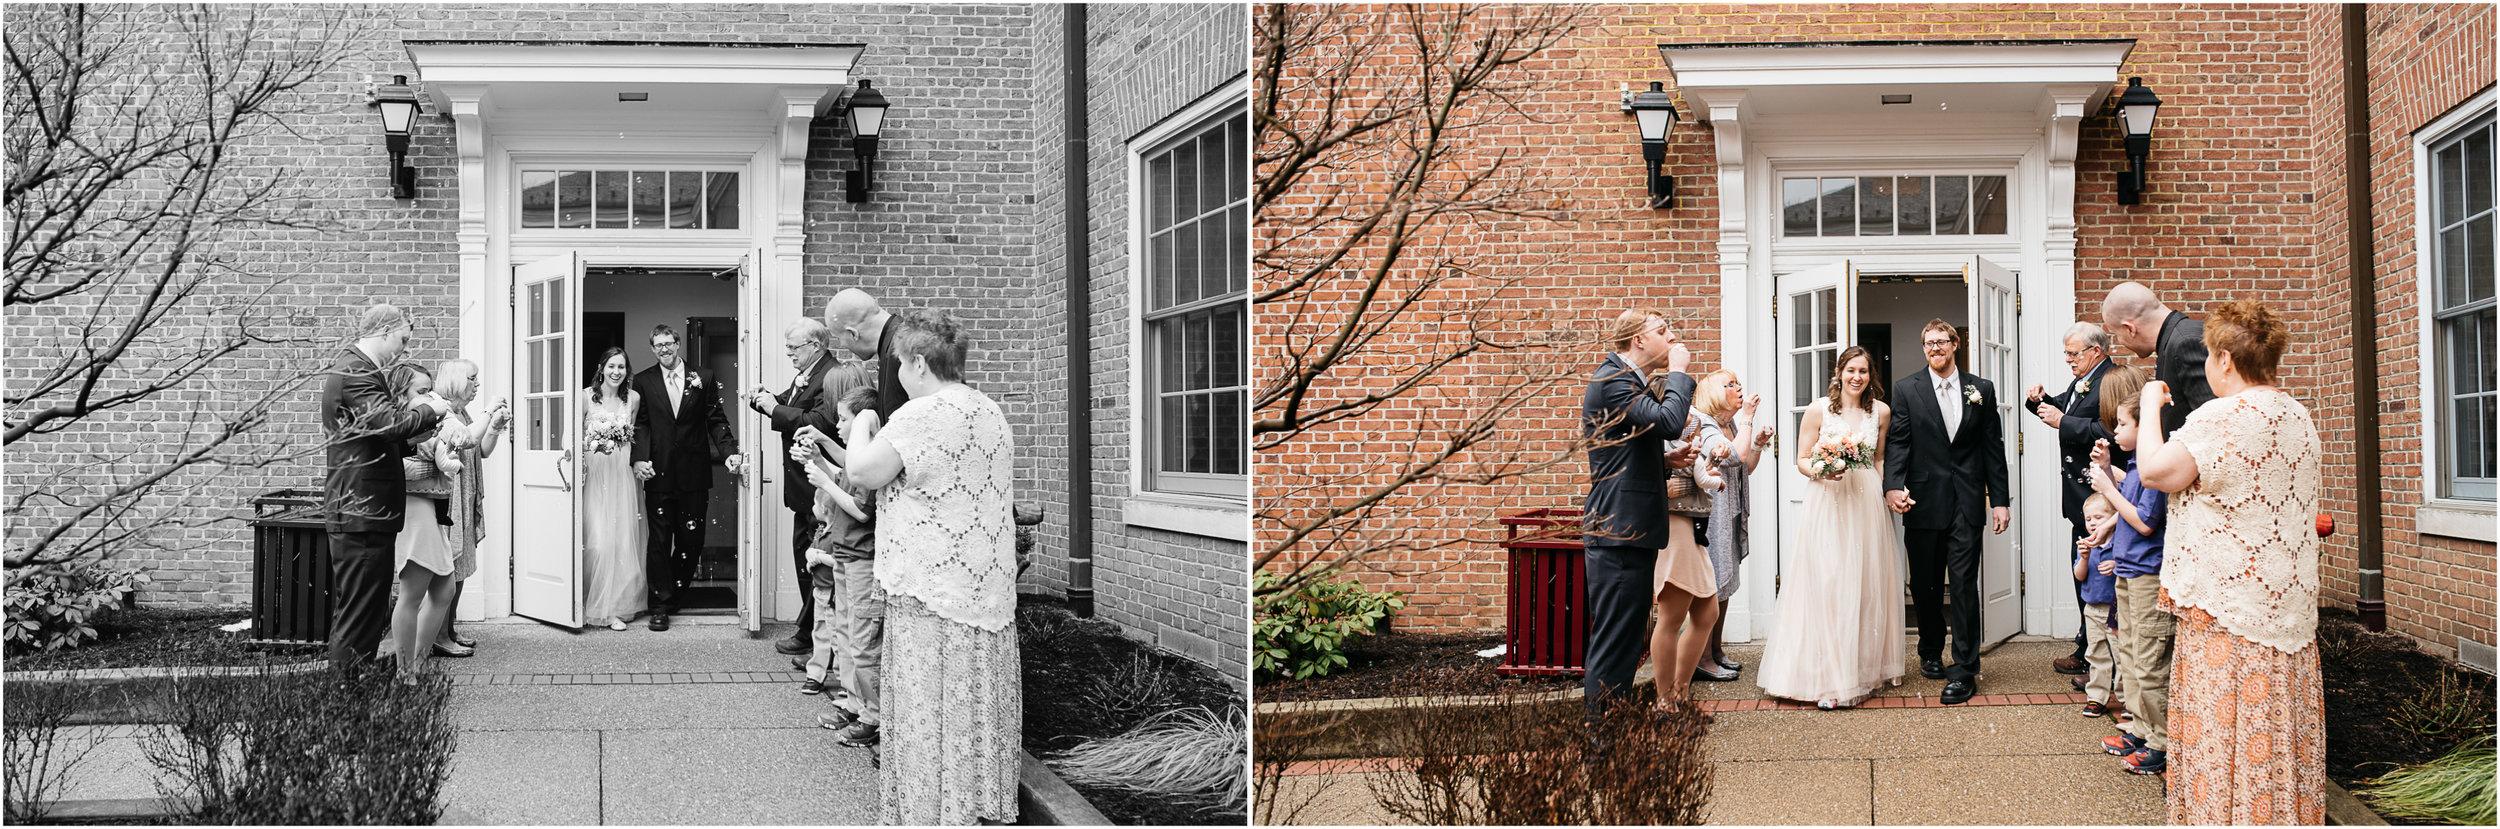 wedding exit ligonier town hall mariah fisher.jpg